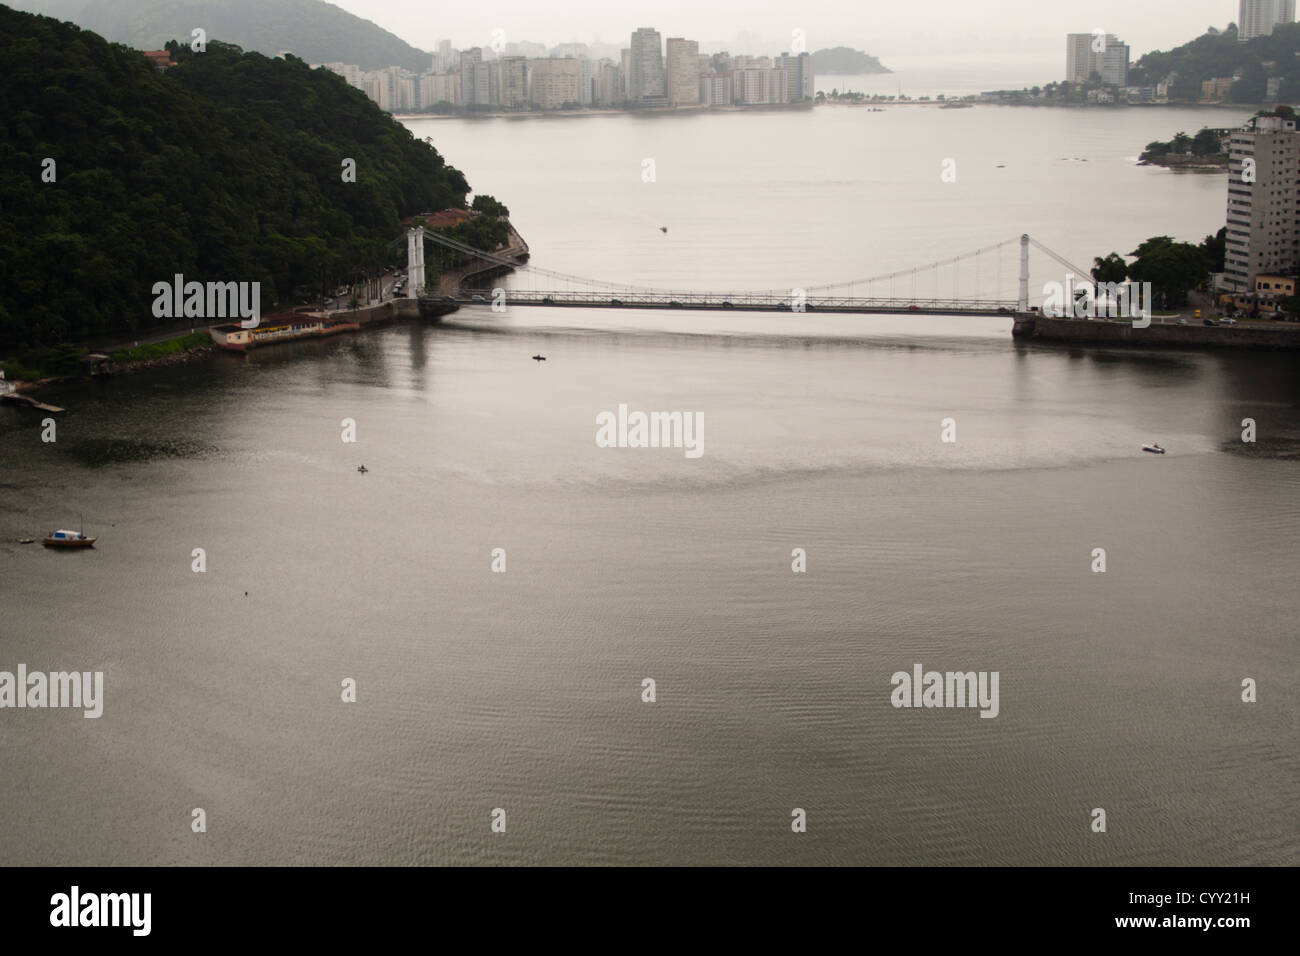 aerial view of Suspension Bridge (Ponte Pensil) between São Vicente and Praia Grande Cities, São Paulo shore, north Brazil. Stock Photo